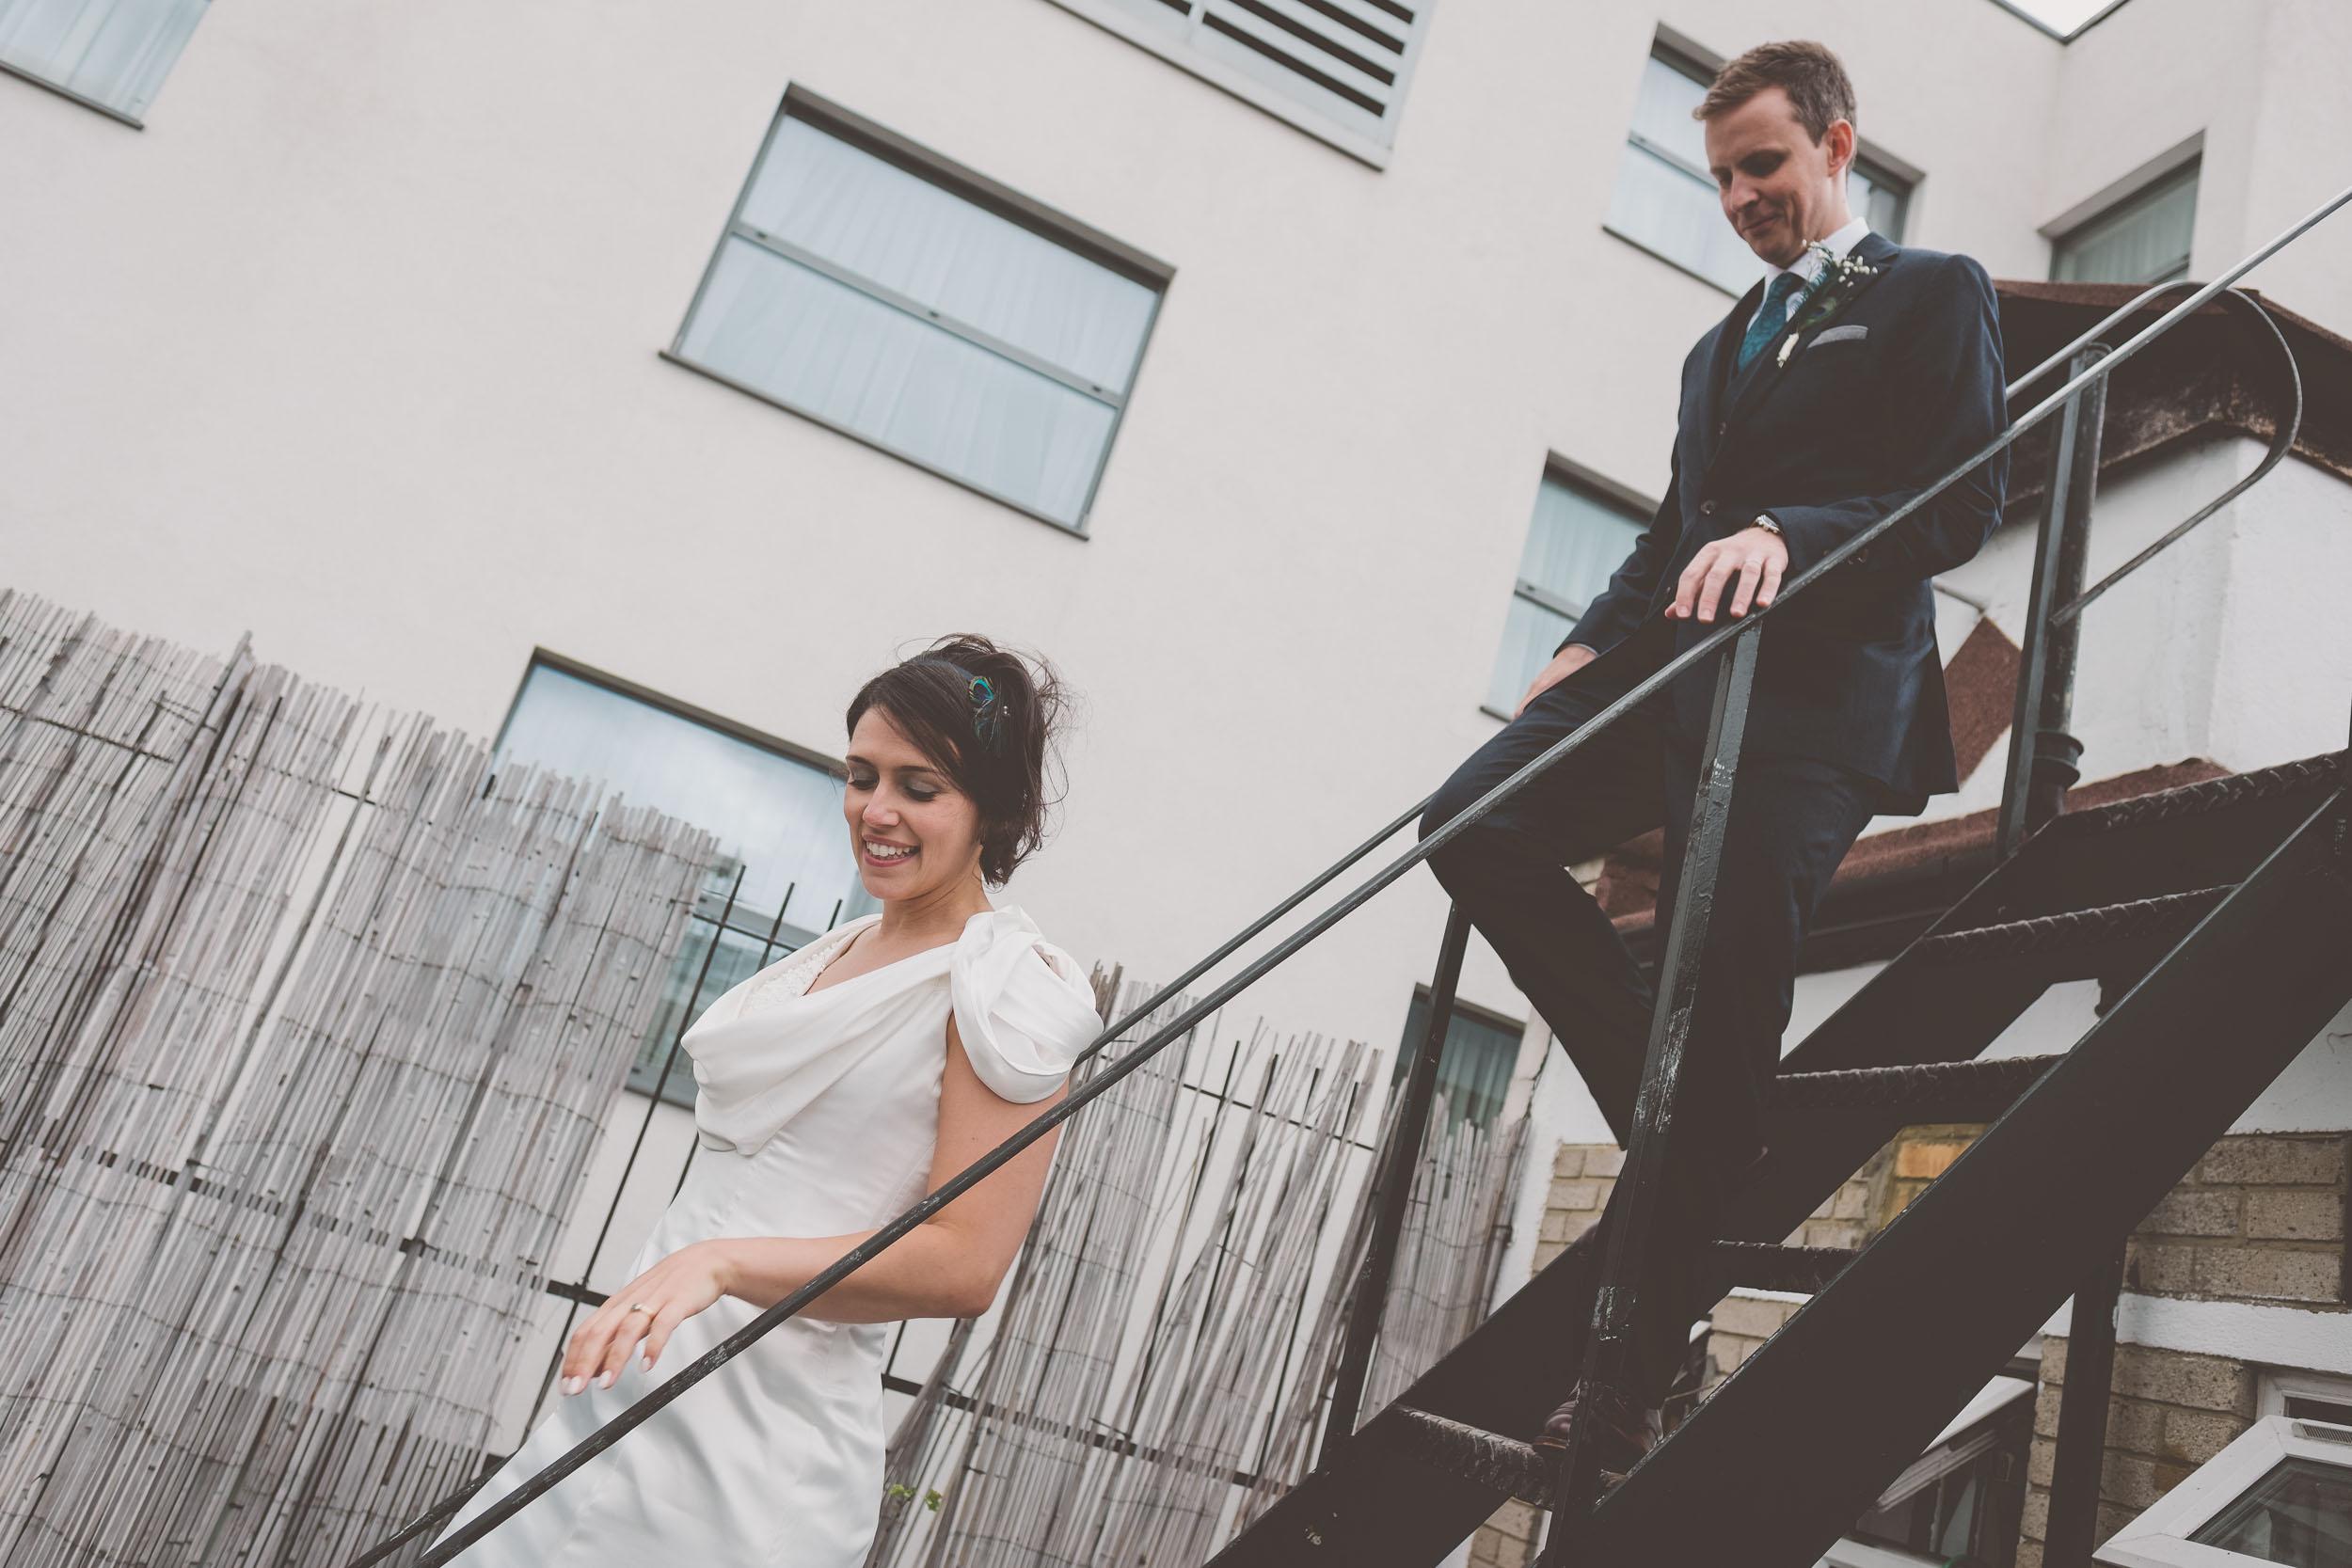 islington-town-hall-4th-floor-studios-wedding303.jpg